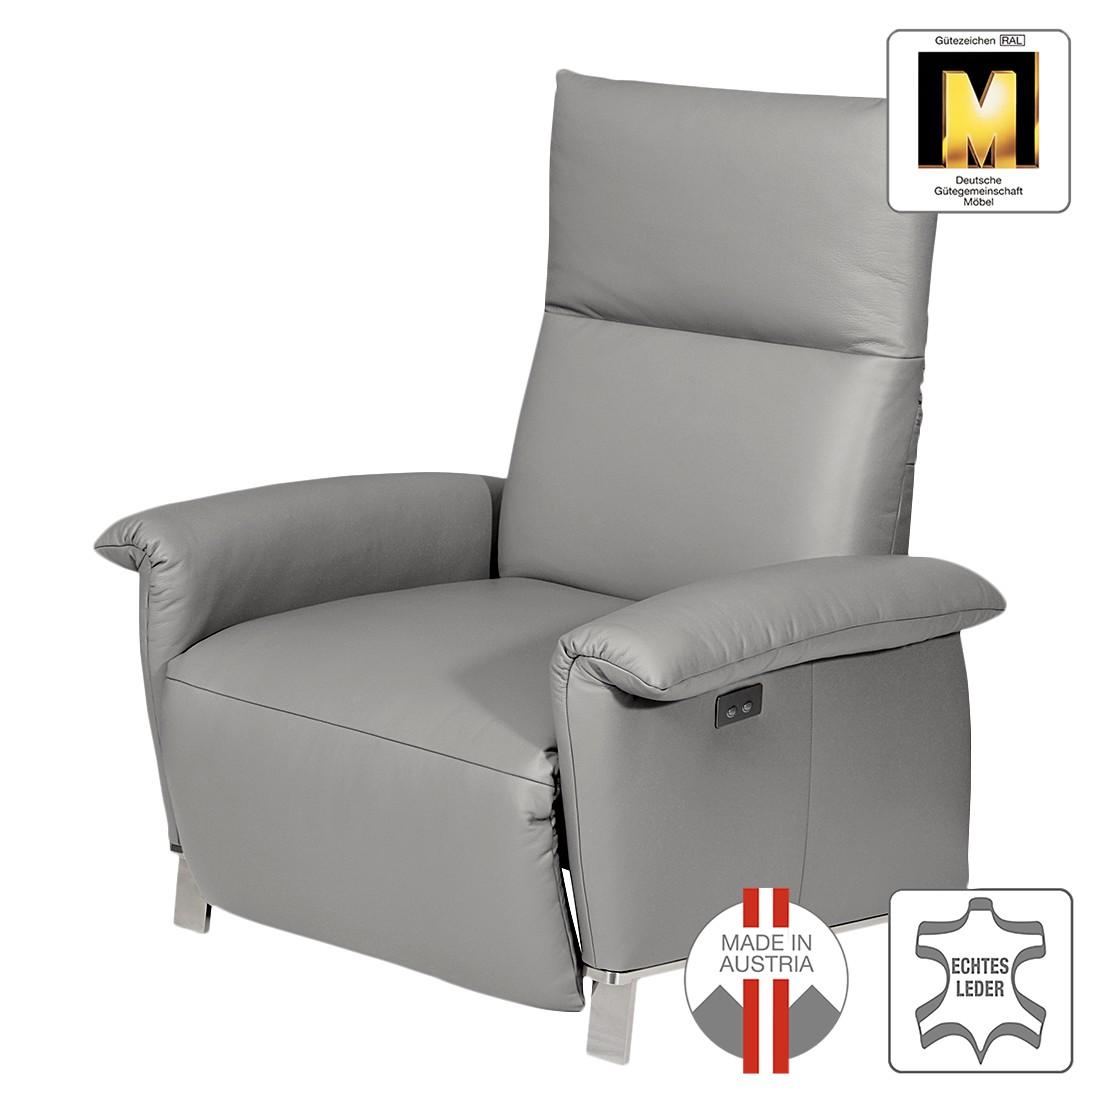 sessel barcelona echtleder mechanische verstellung. Black Bedroom Furniture Sets. Home Design Ideas